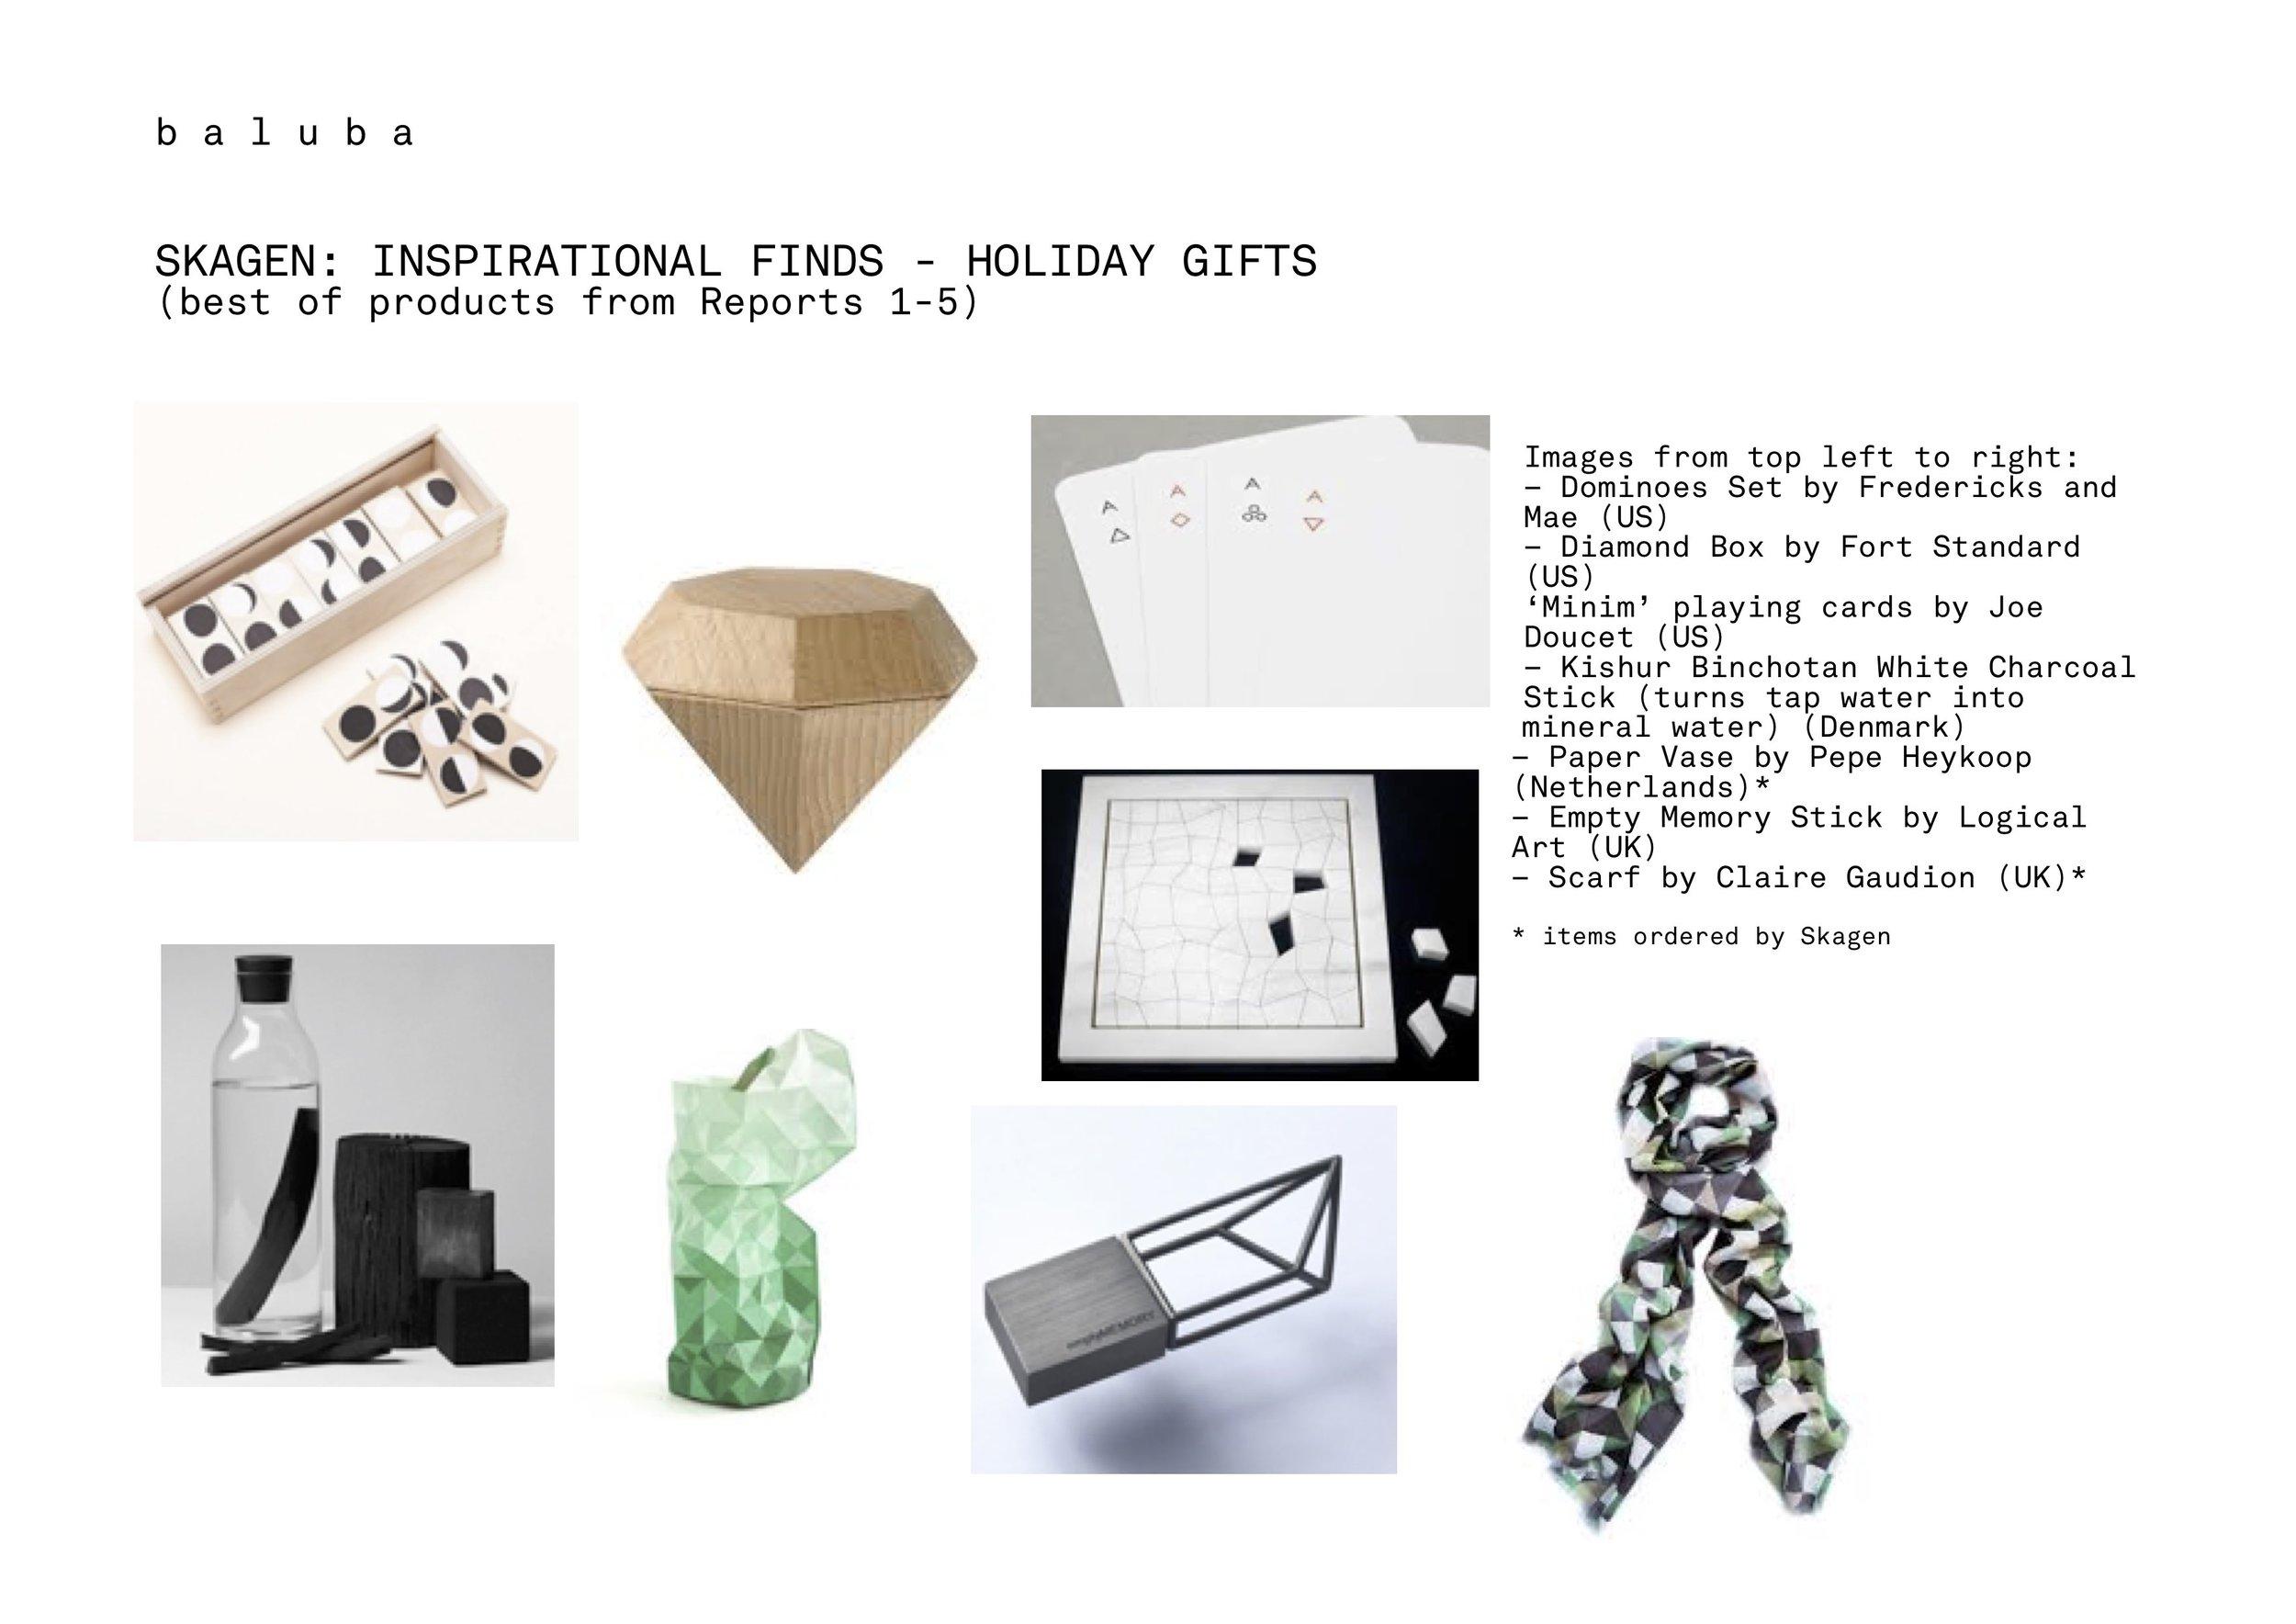 4) Skagen Inspiration Finds for Holiday Gifts copy.jpg